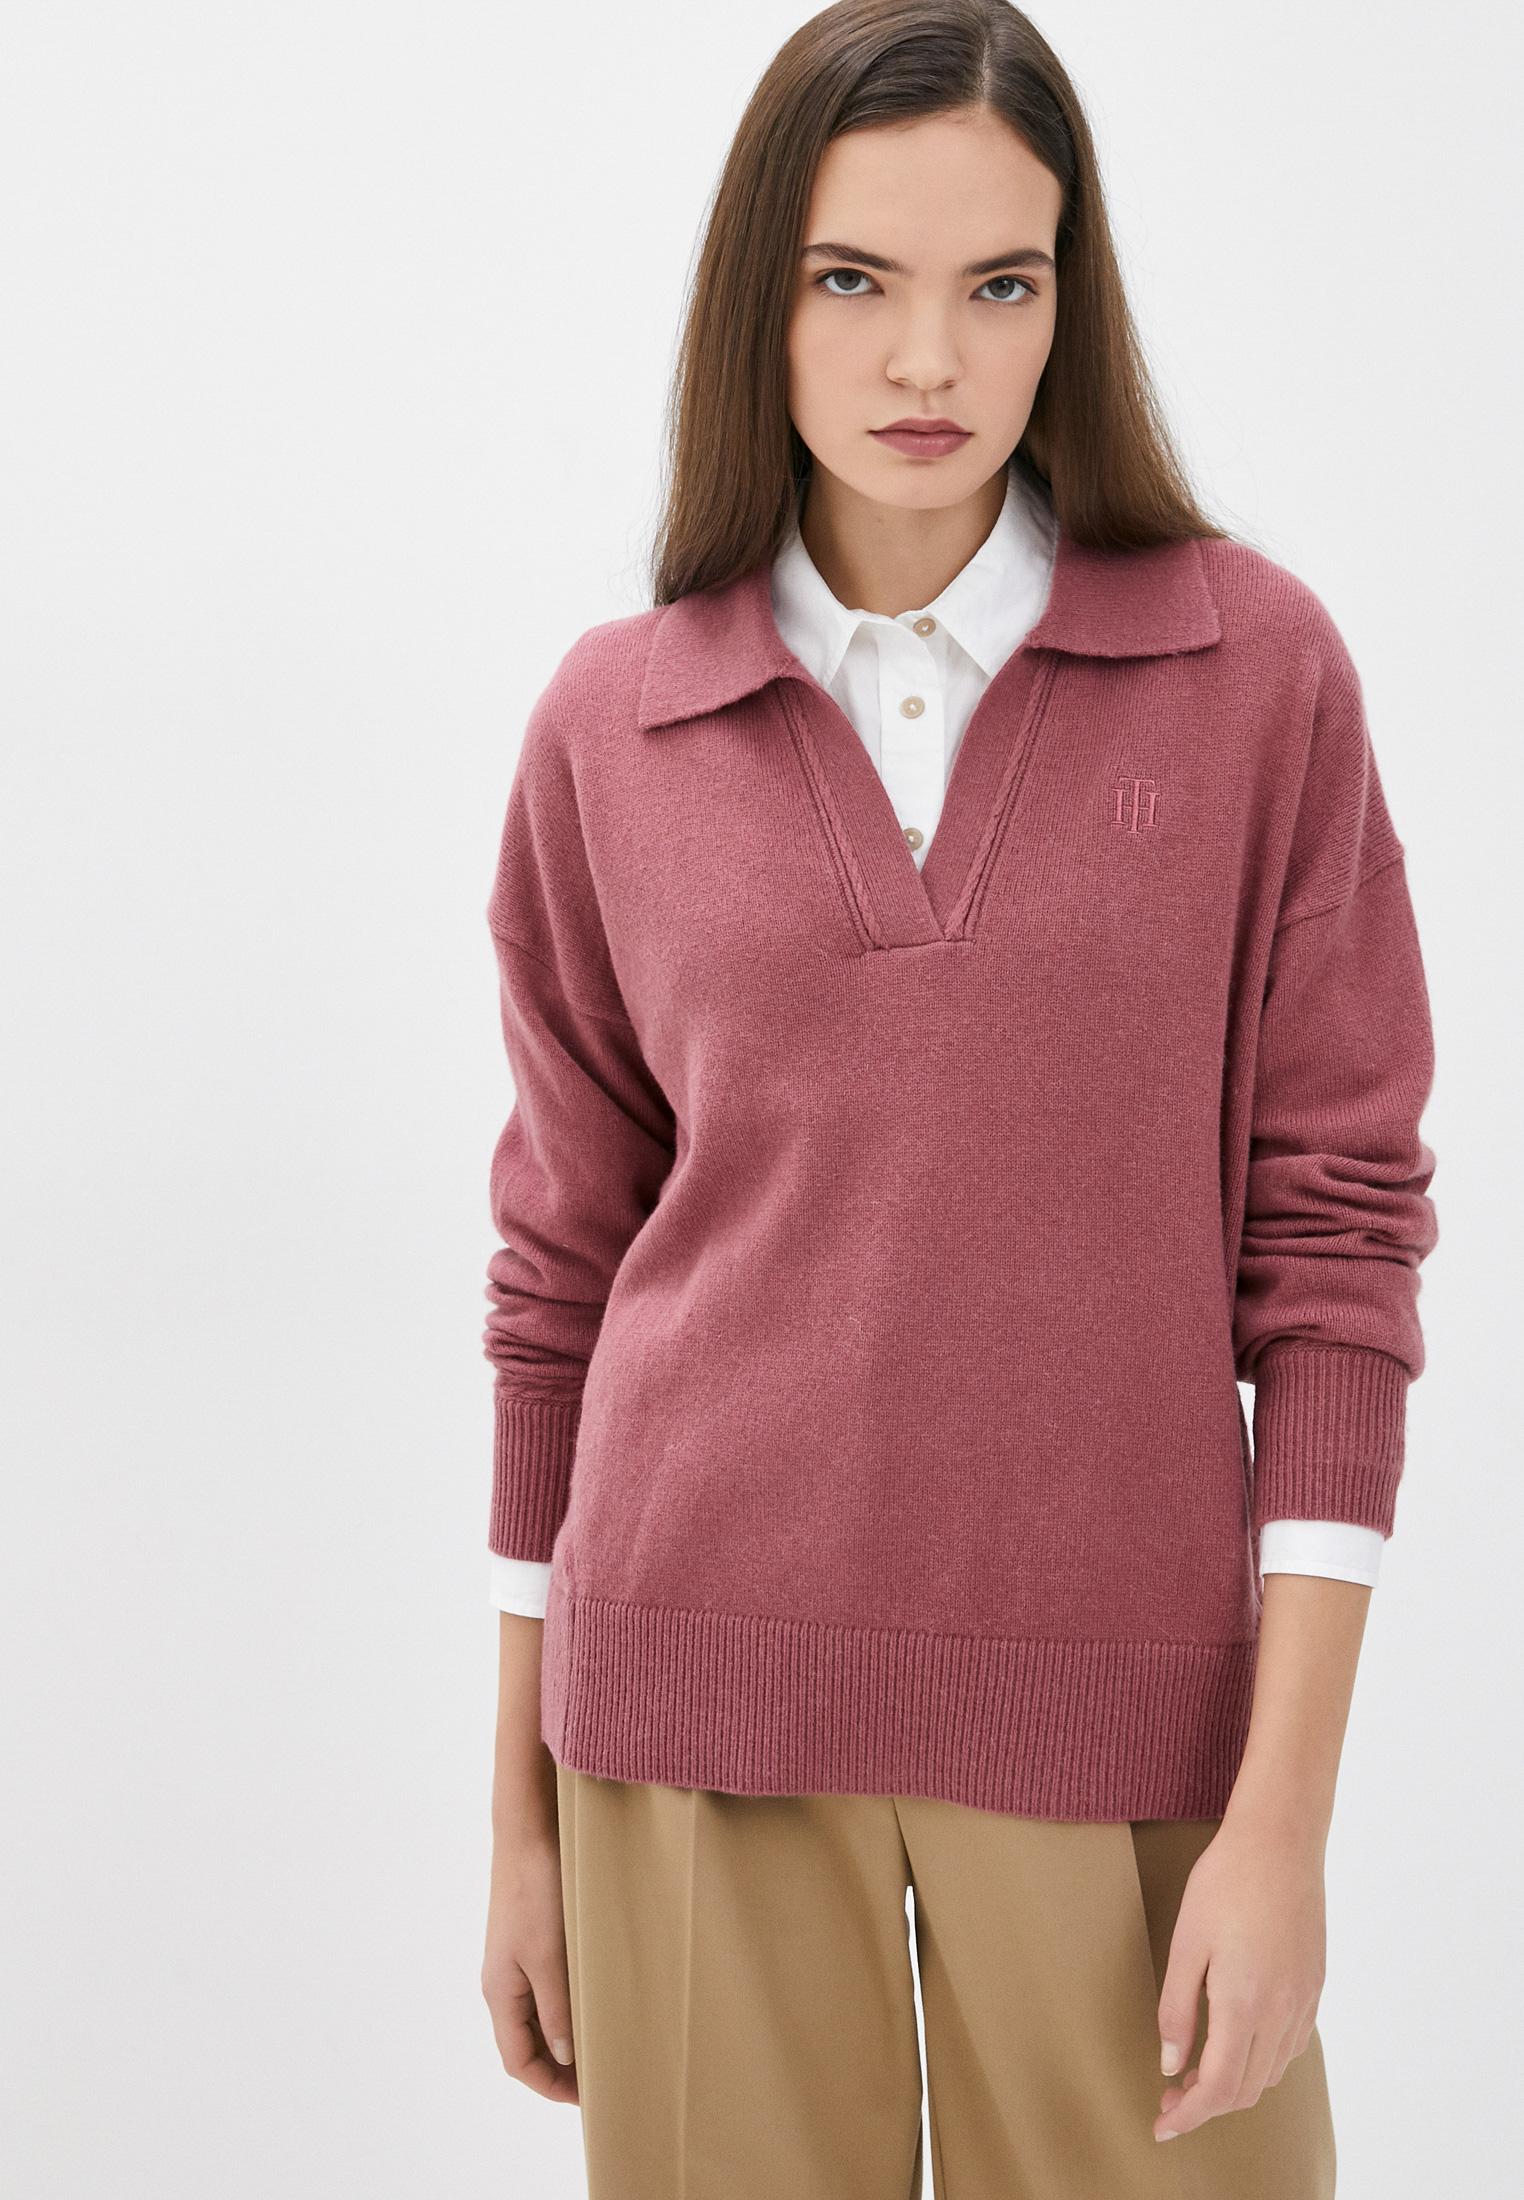 Пуловер Tommy Hilfiger (Томми Хилфигер) WW0WW32298